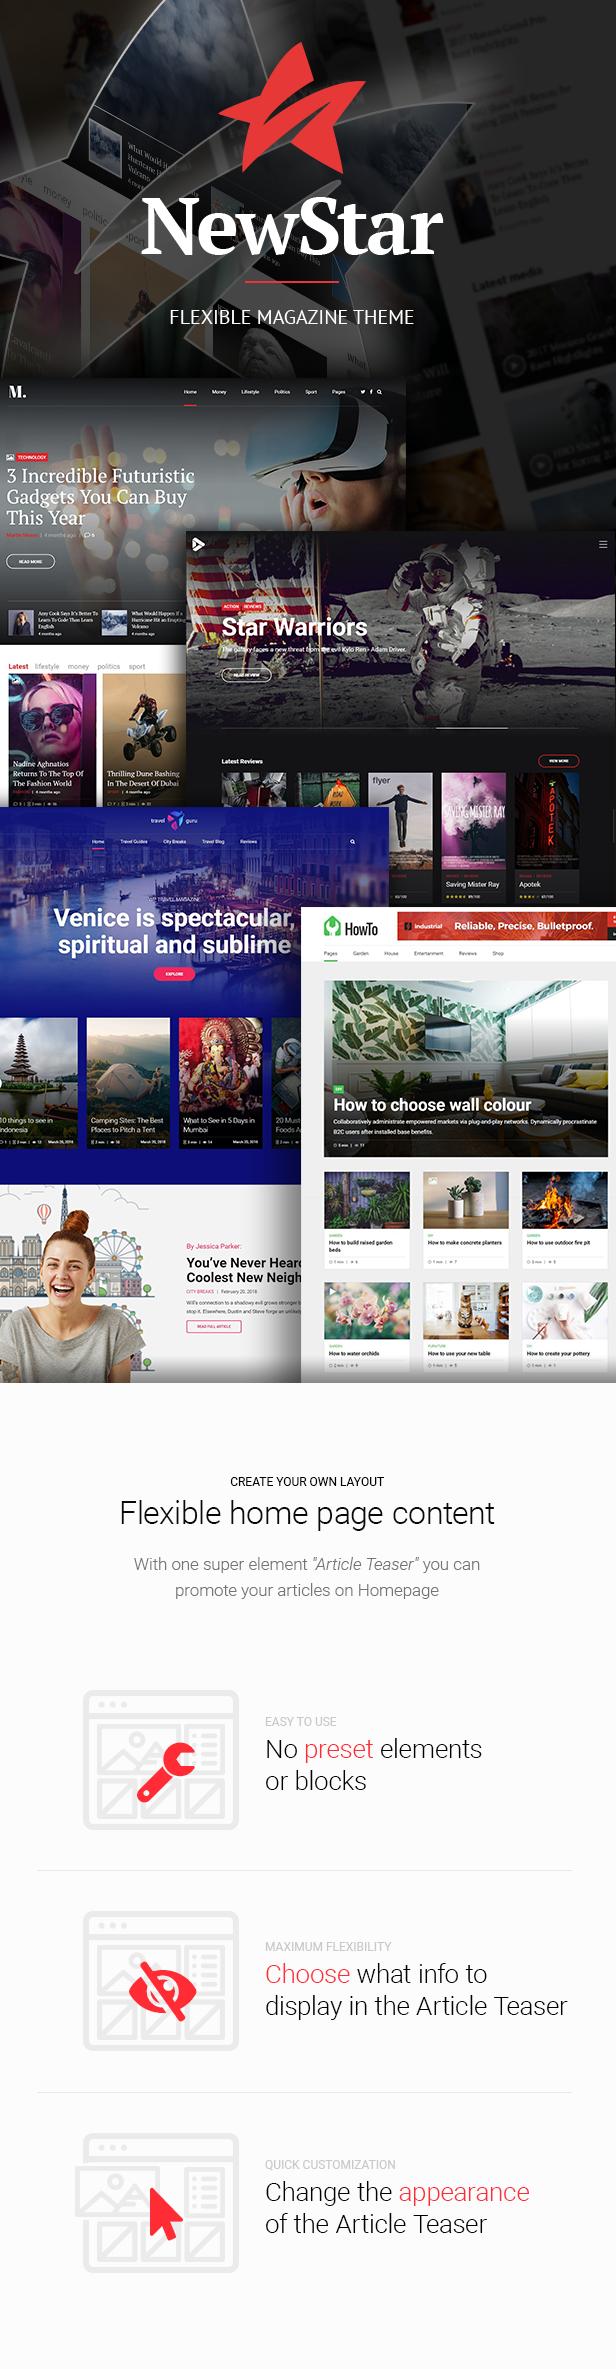 NewStar Magazine - Flexible Magazine Theme